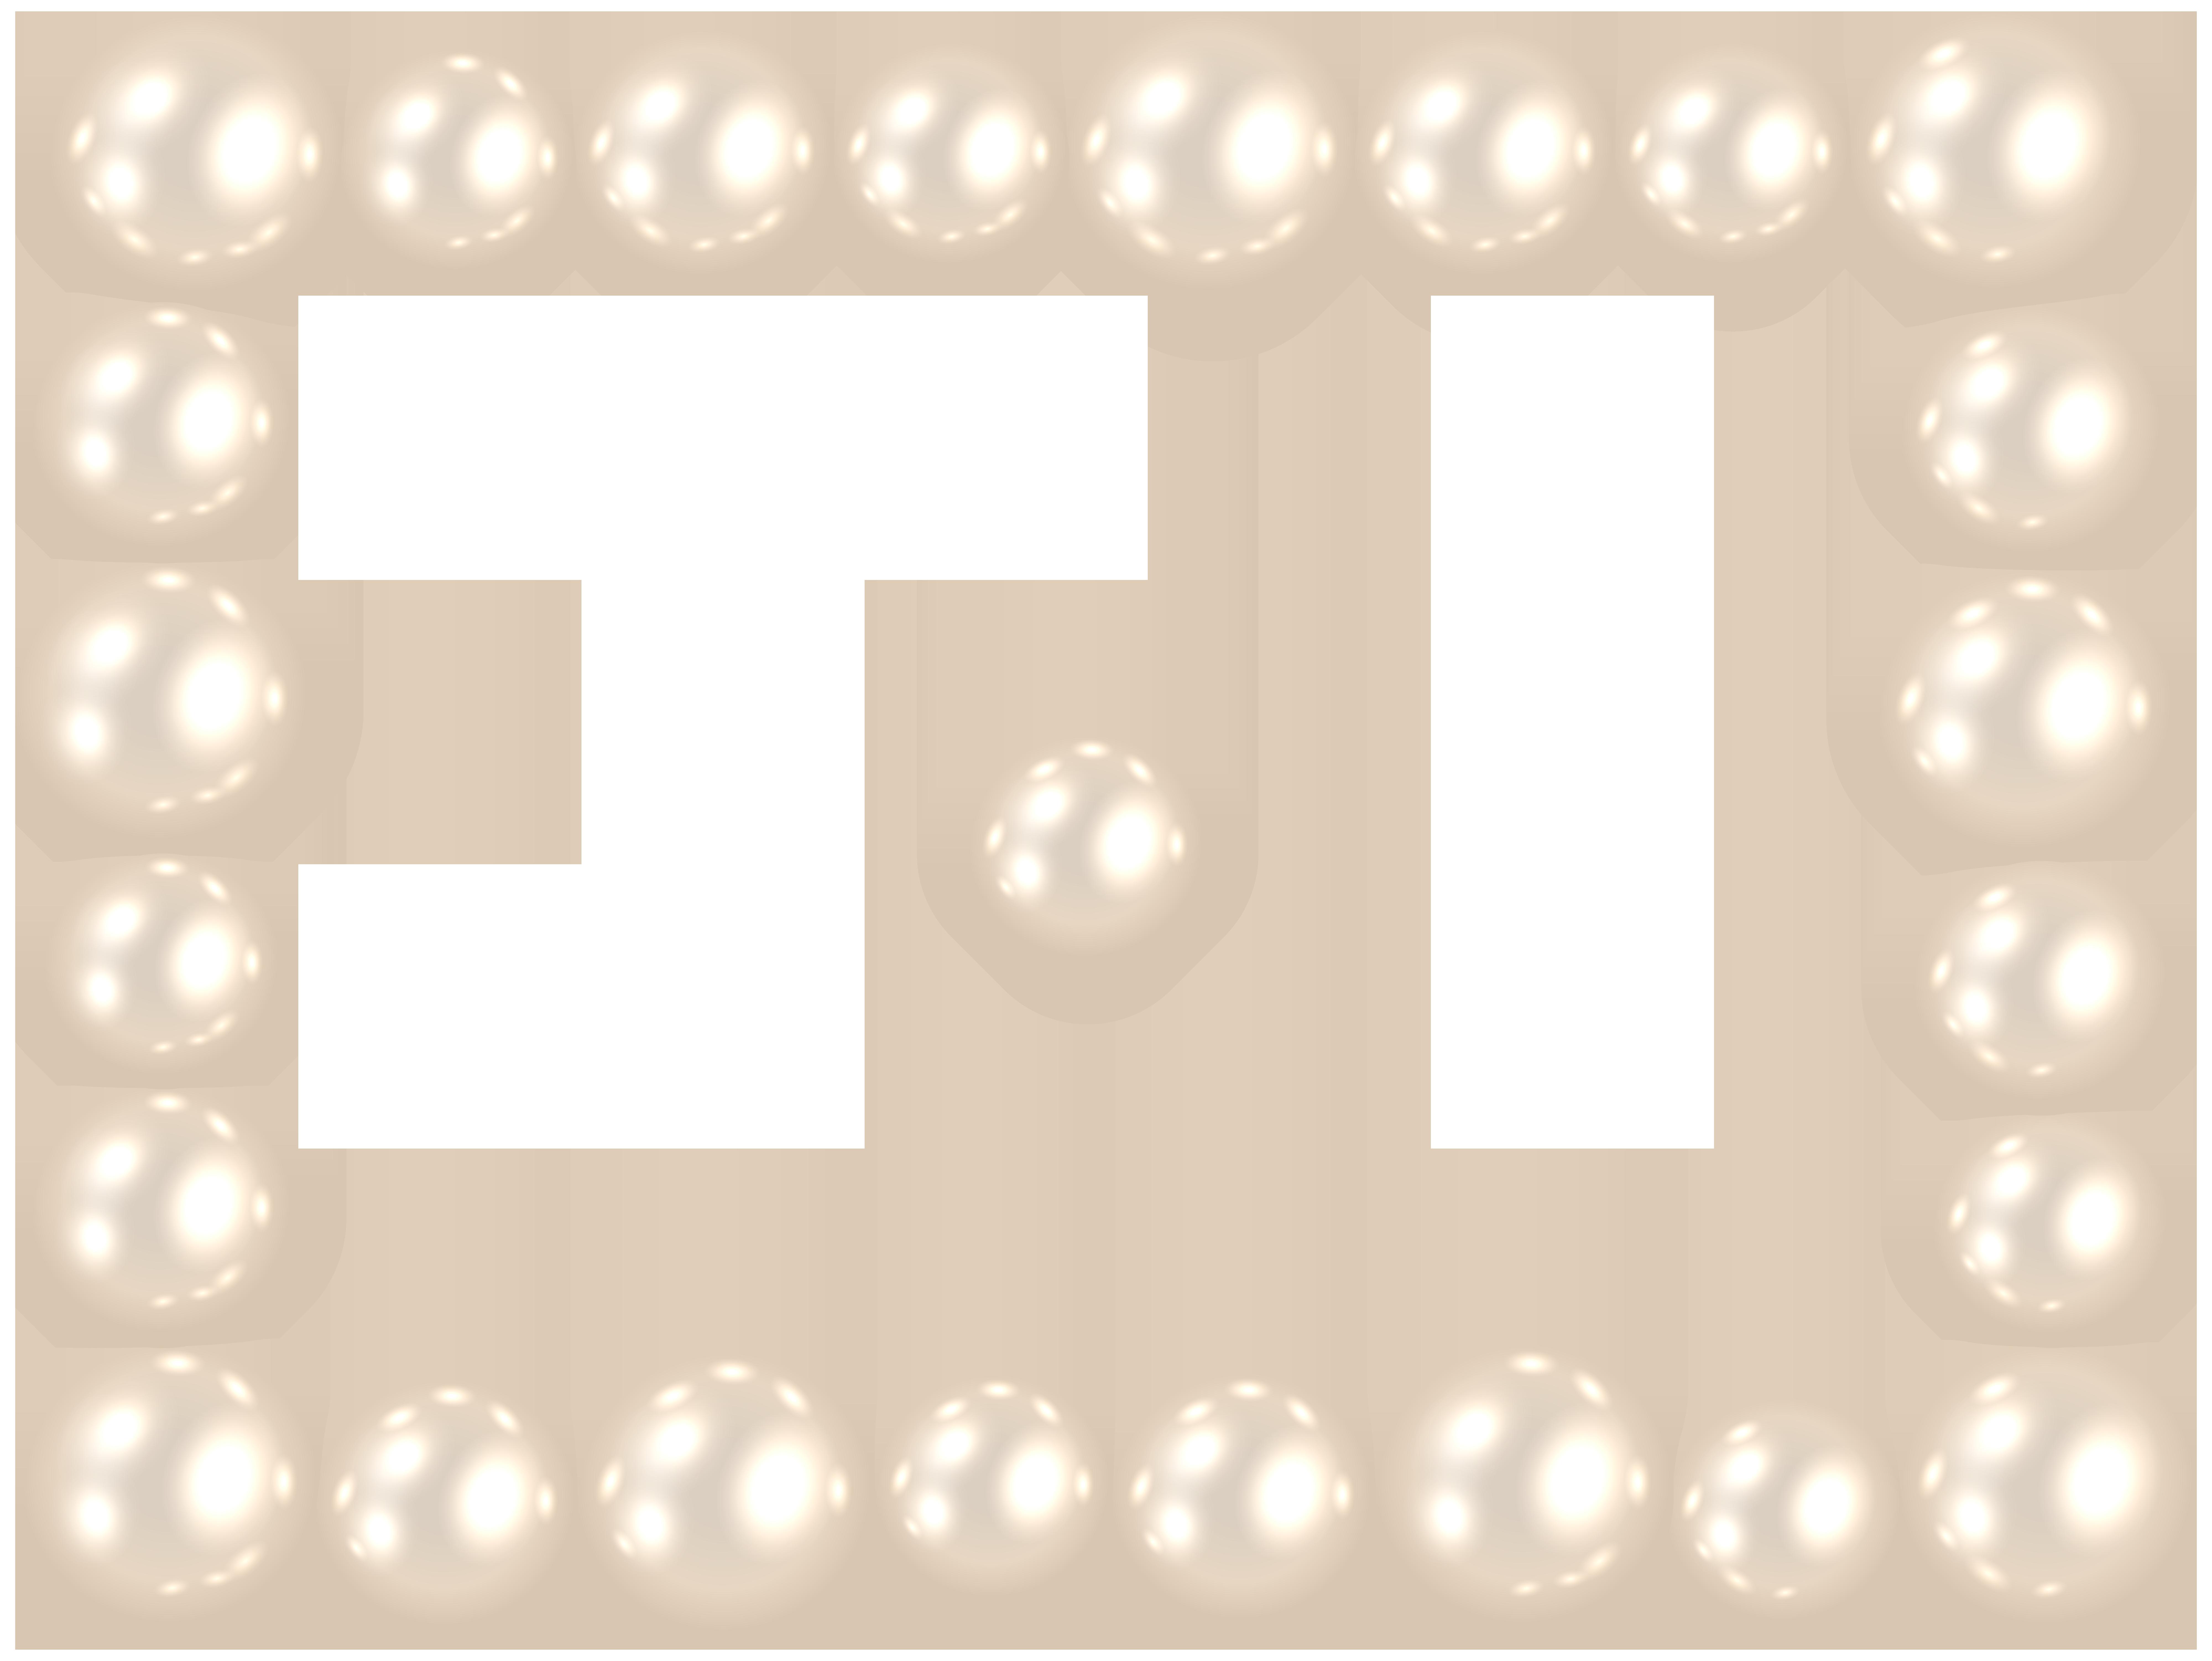 Pearl Frame PNG Clip Art Image.